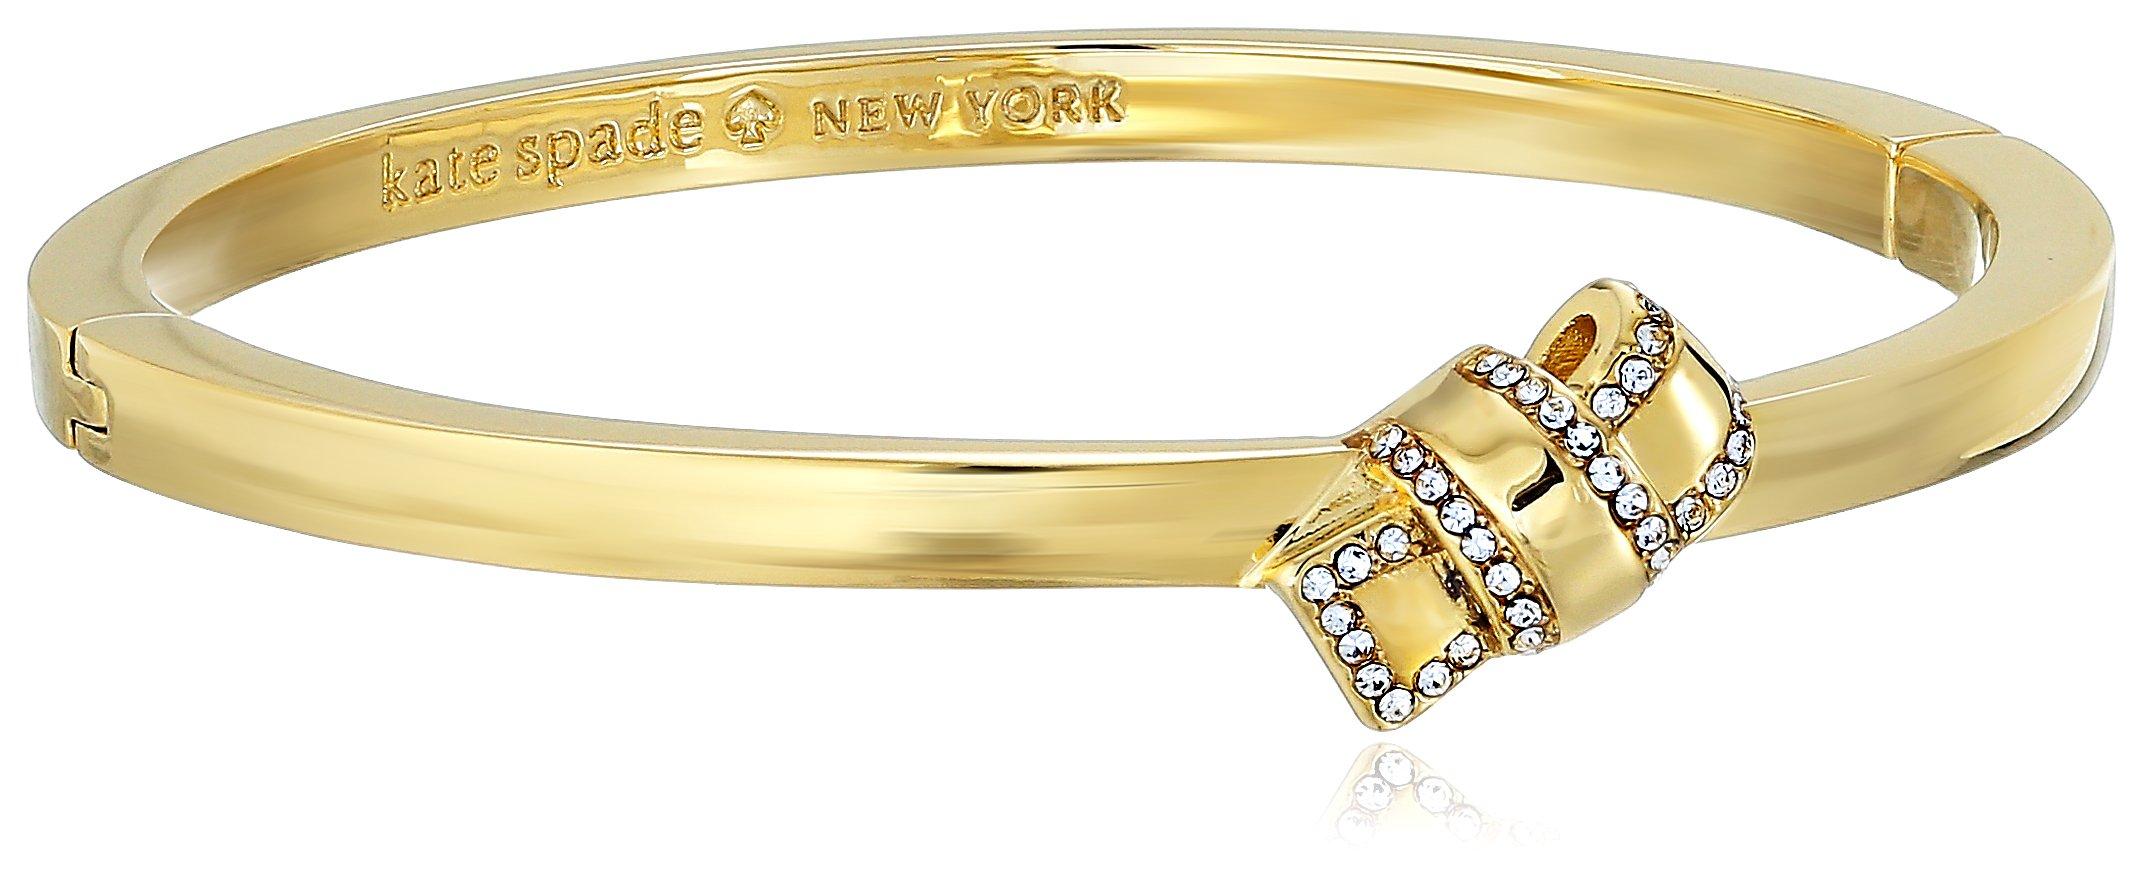 Kate Spade New York Pave Knot Hinged Gold Bangle Bracelet by Kate Spade New York (Image #1)